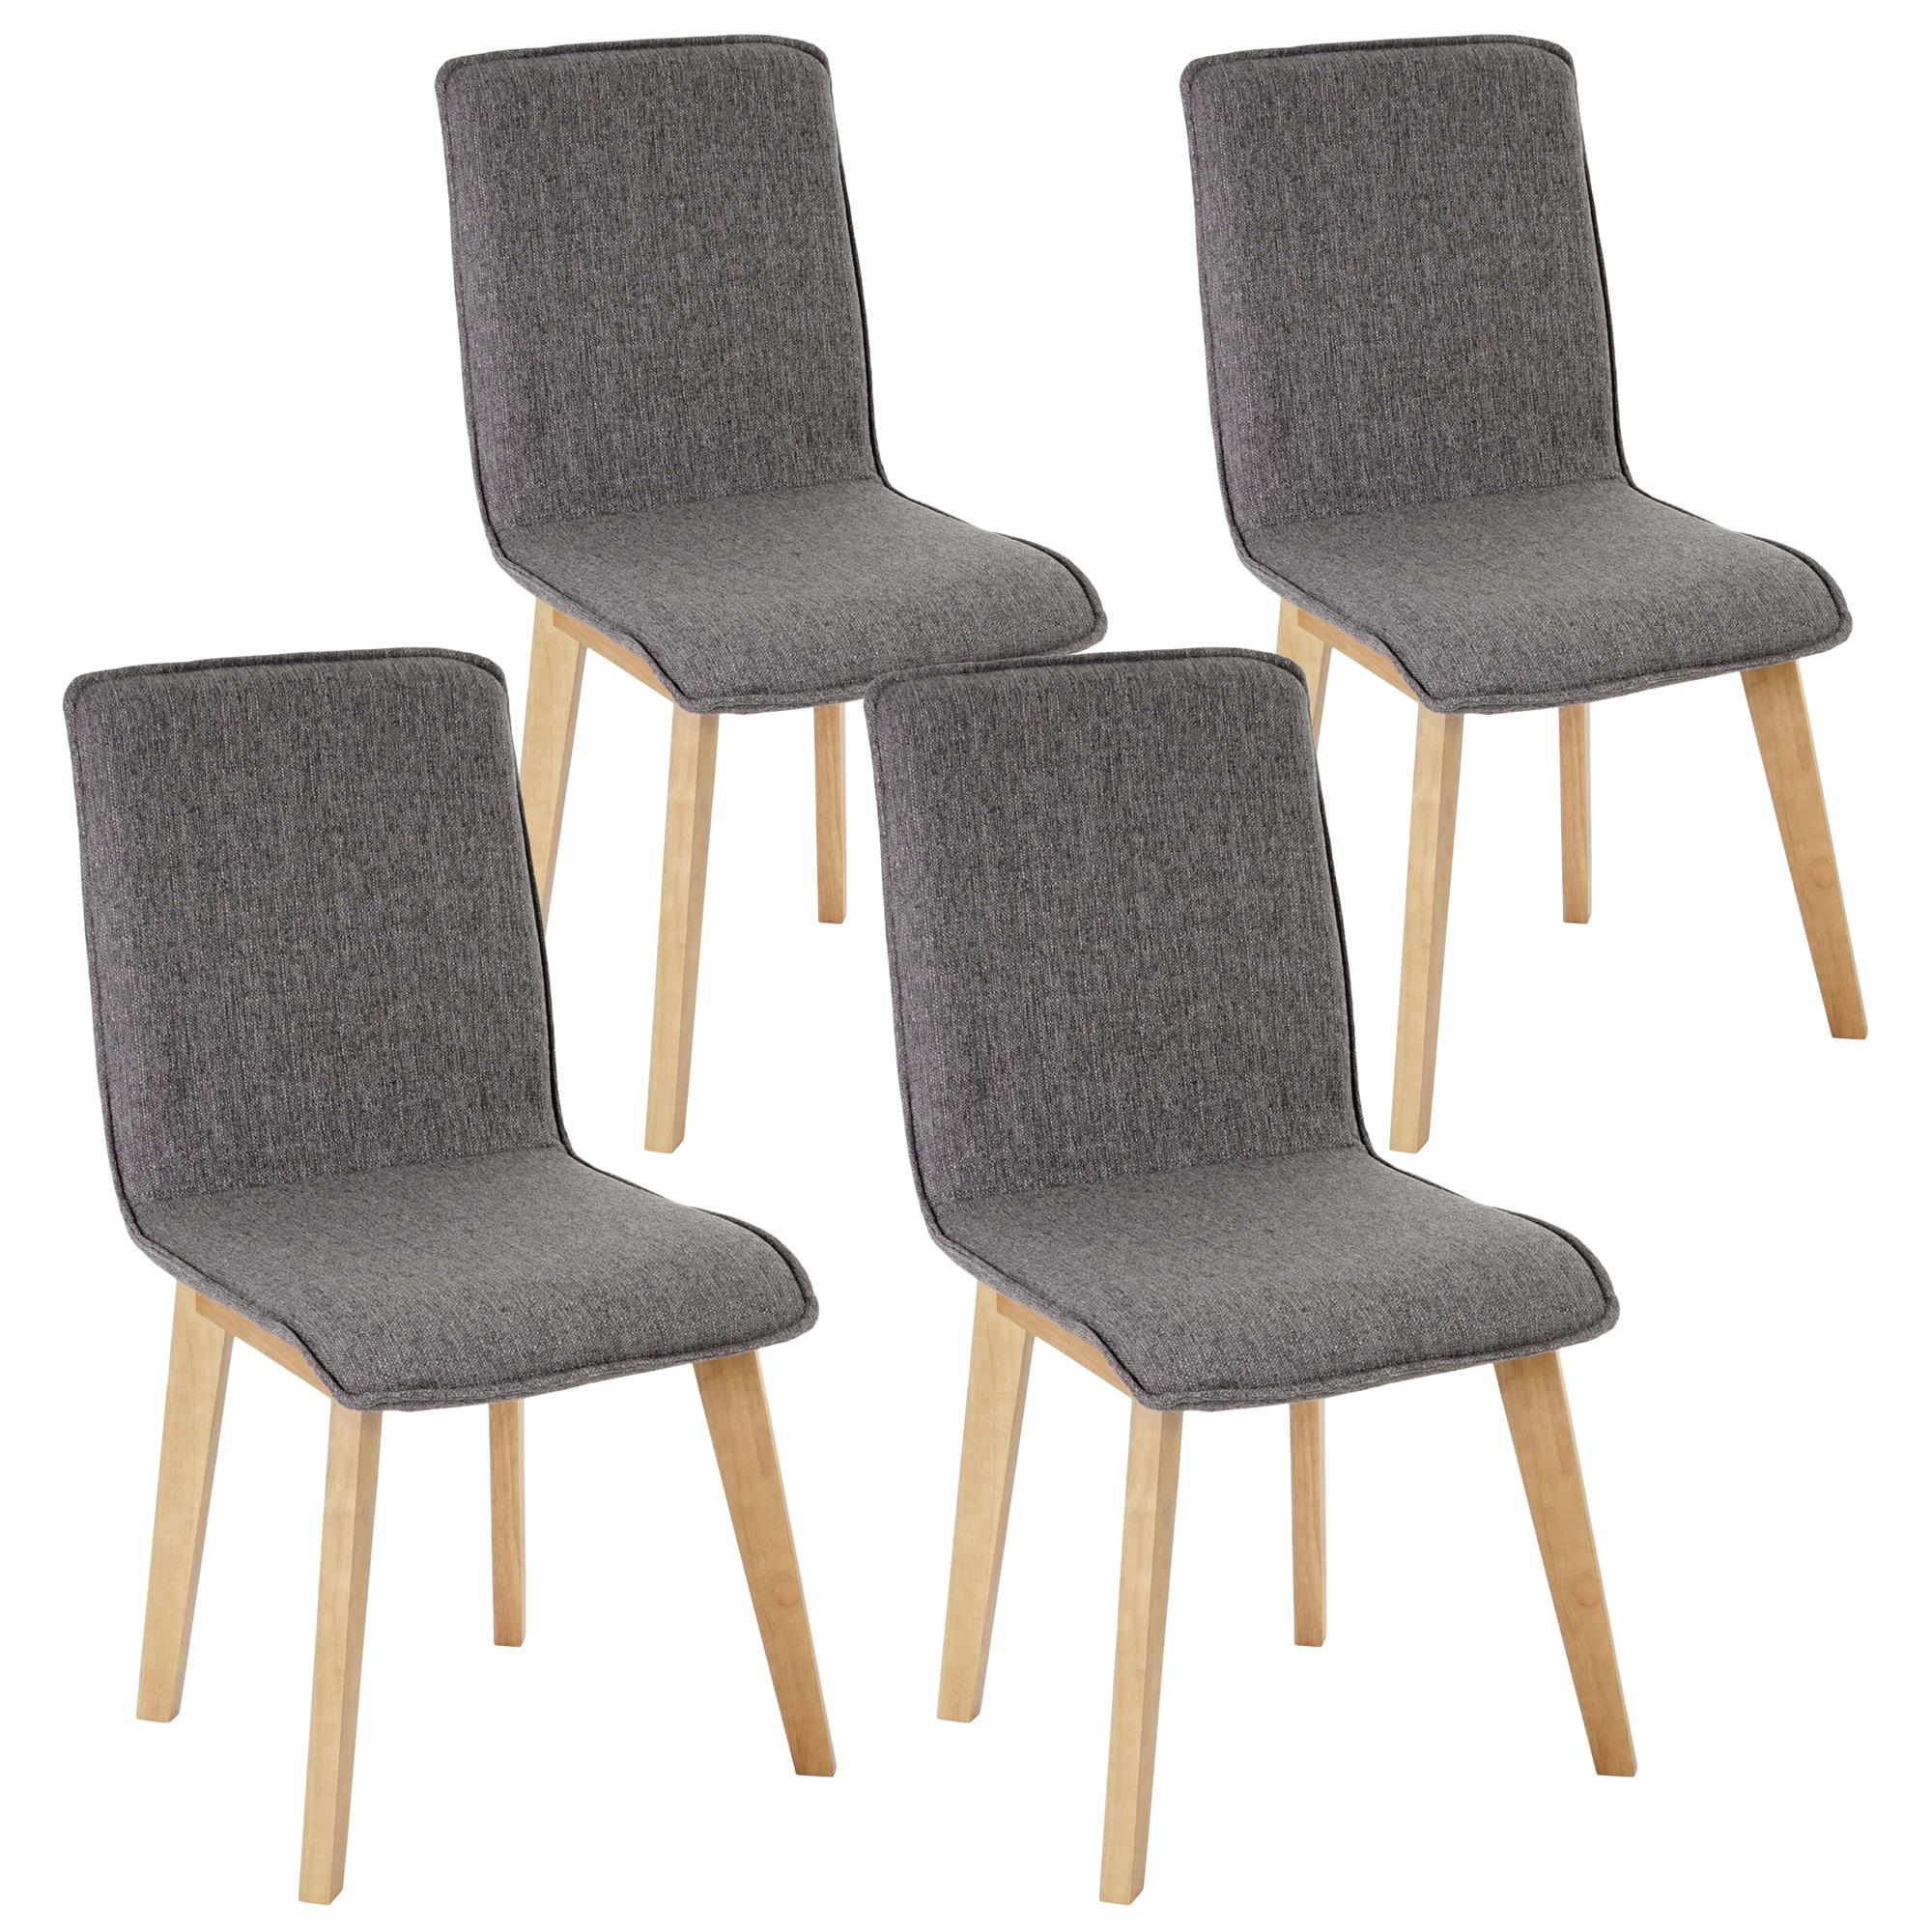 Lote 4 sillas de cocina o comedor ford en tela gris for Sillas de comedor tapizadas en gris